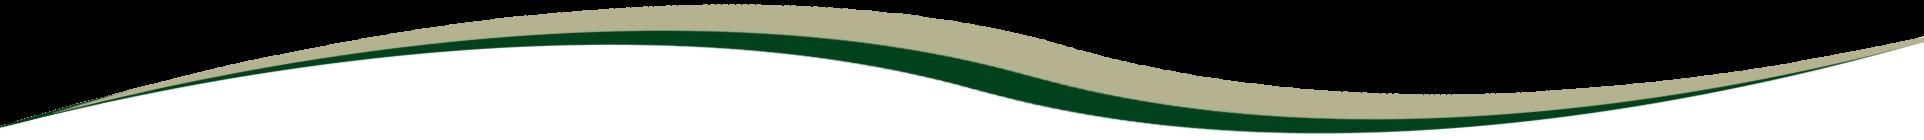 Landscape Wave